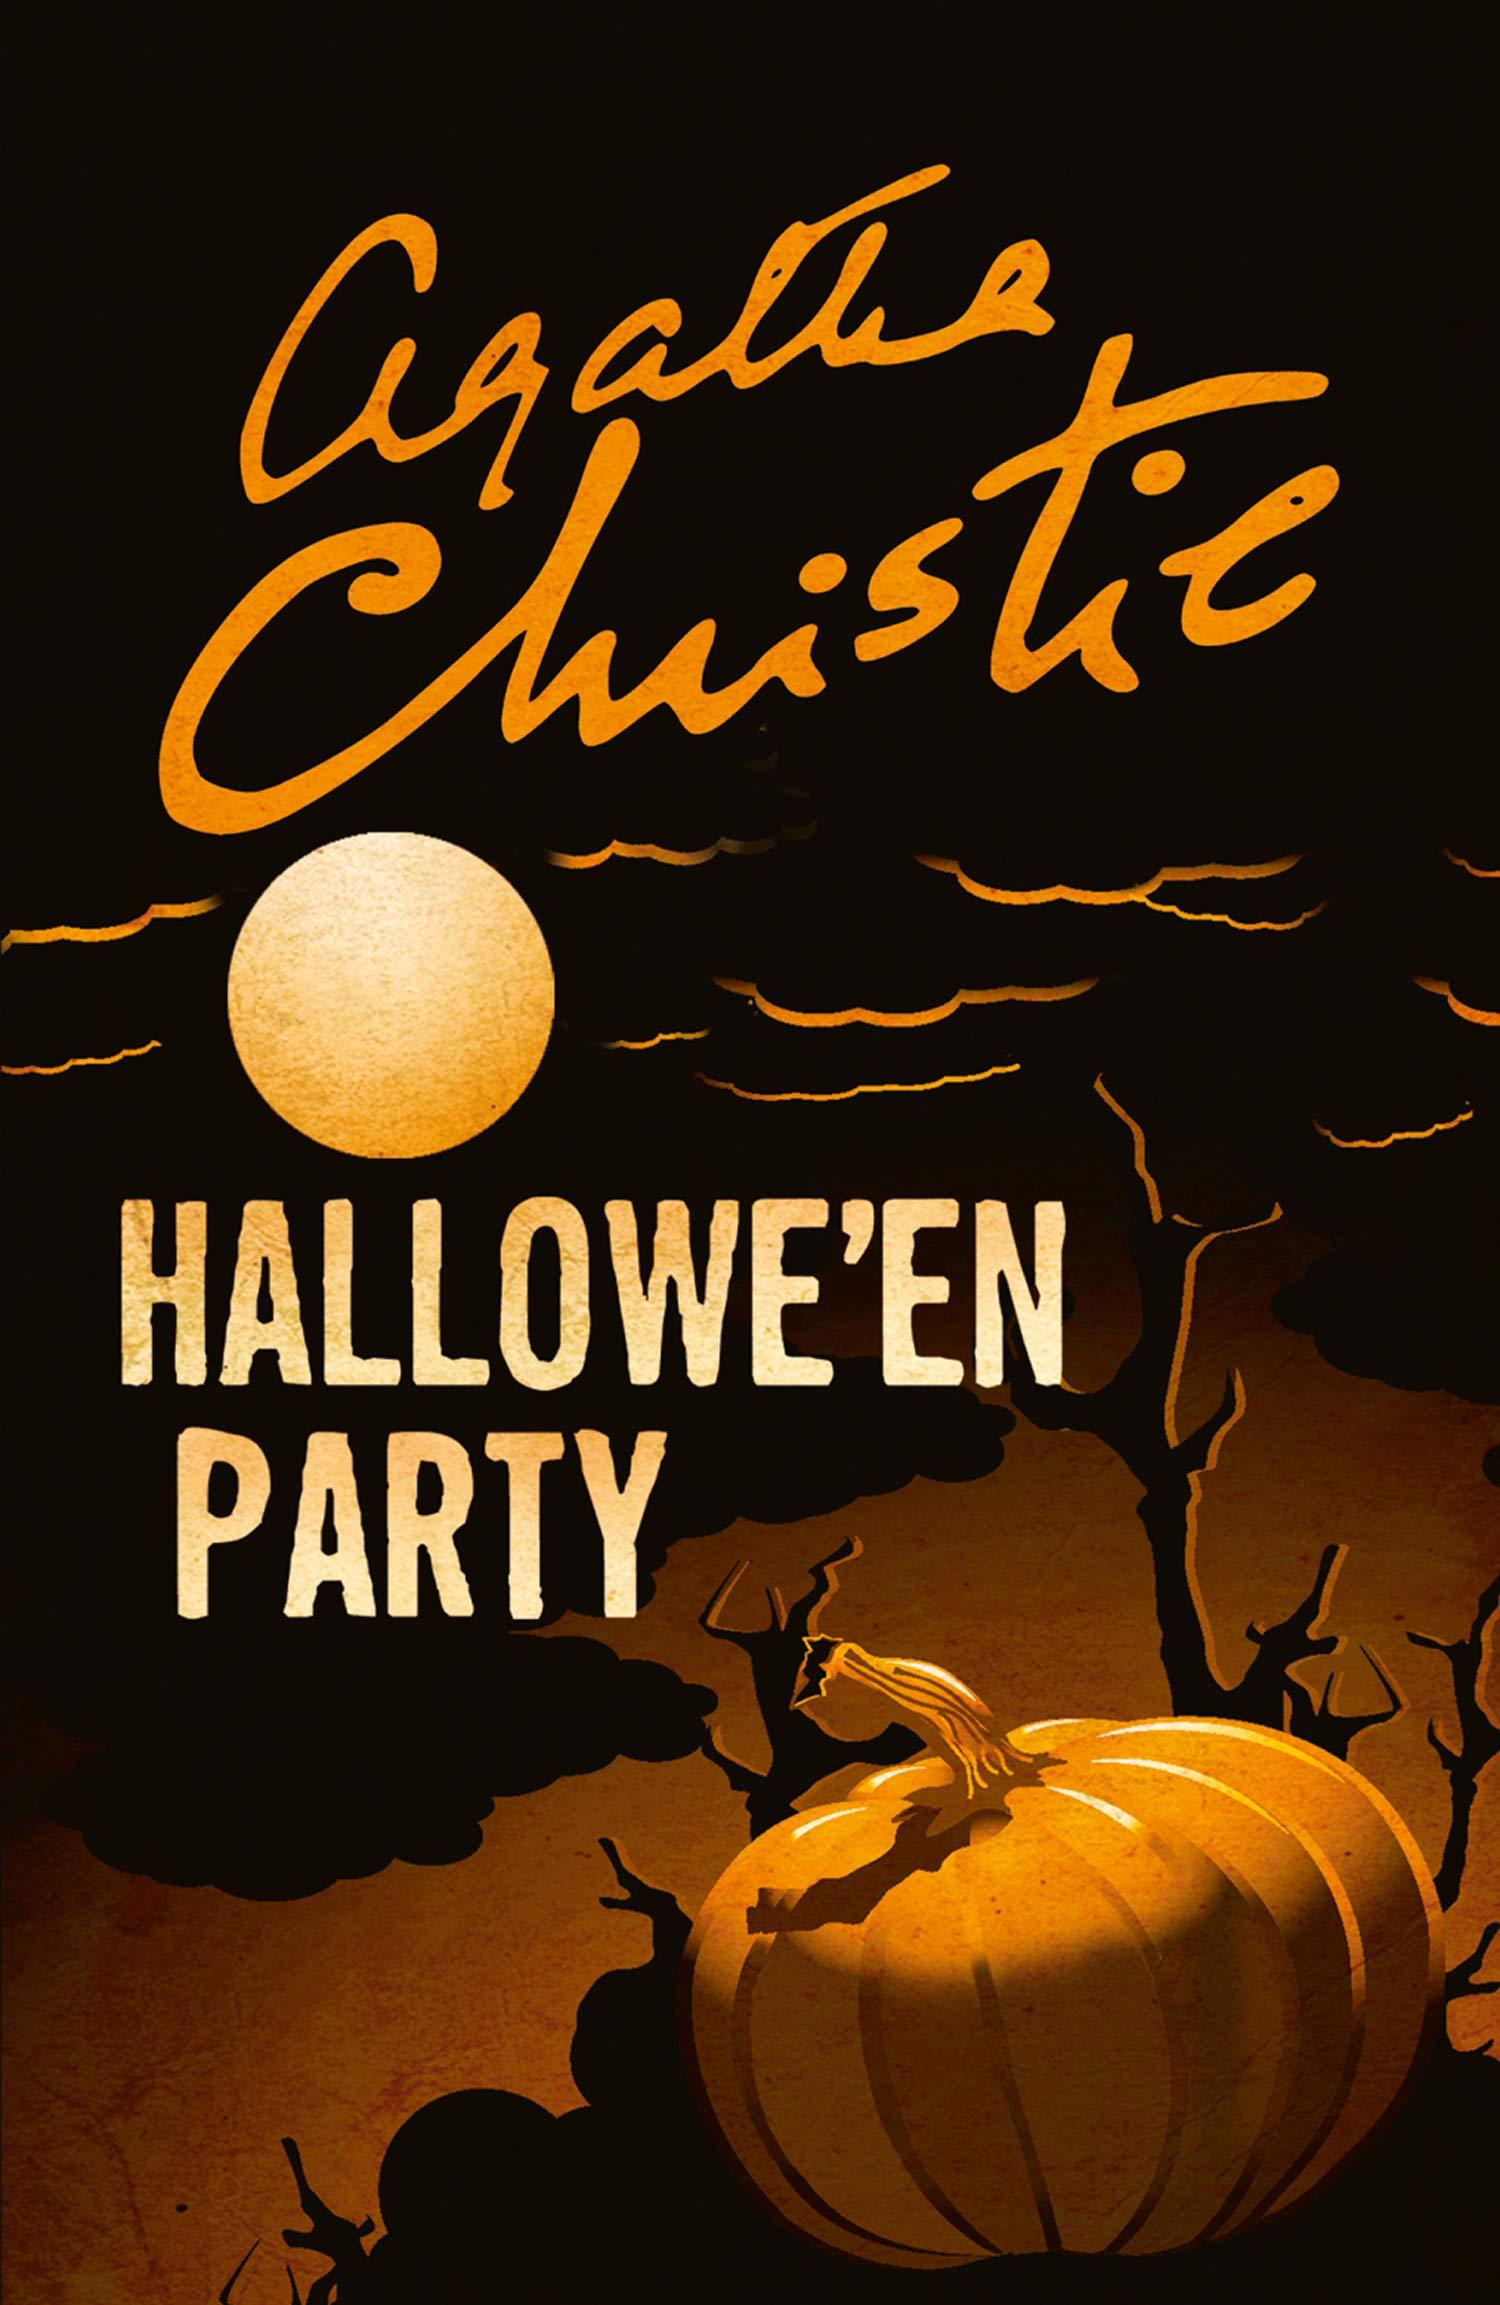 Hallowe'en Party (Poirot): Amazon.co.uk: Christie: 9780008129613: Books